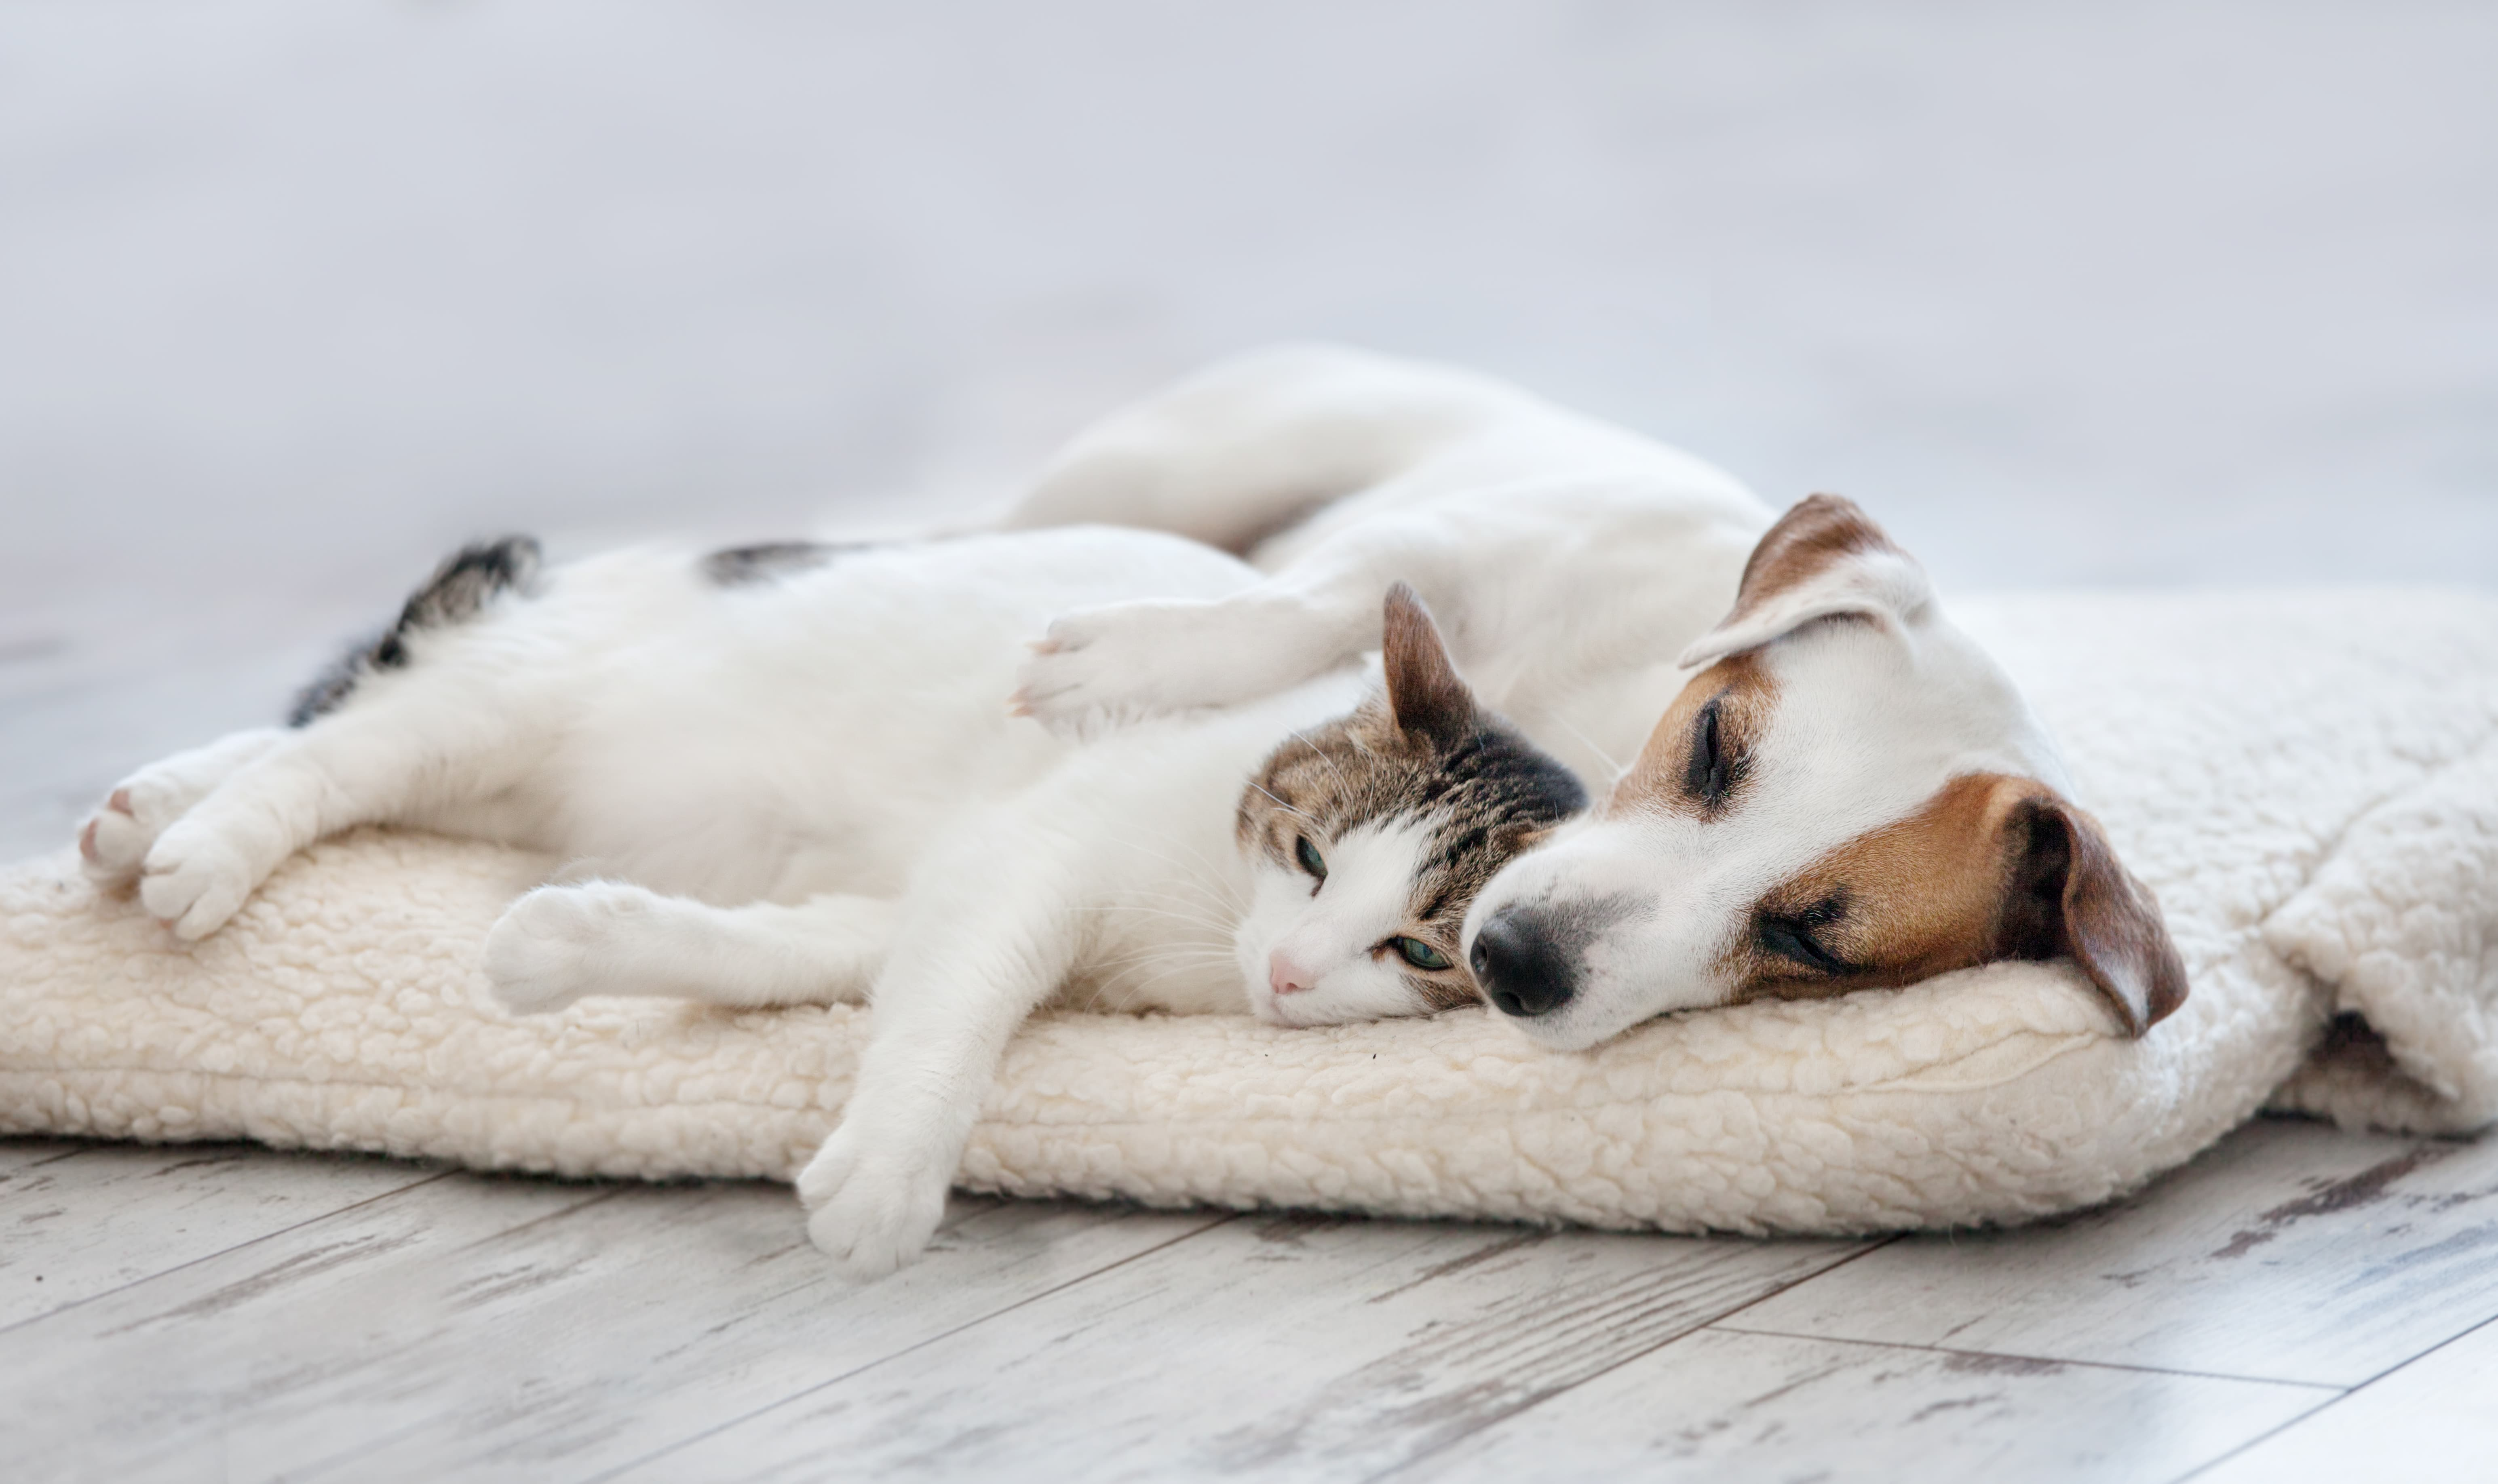 Our Top 5 Pet Essentials Picks!